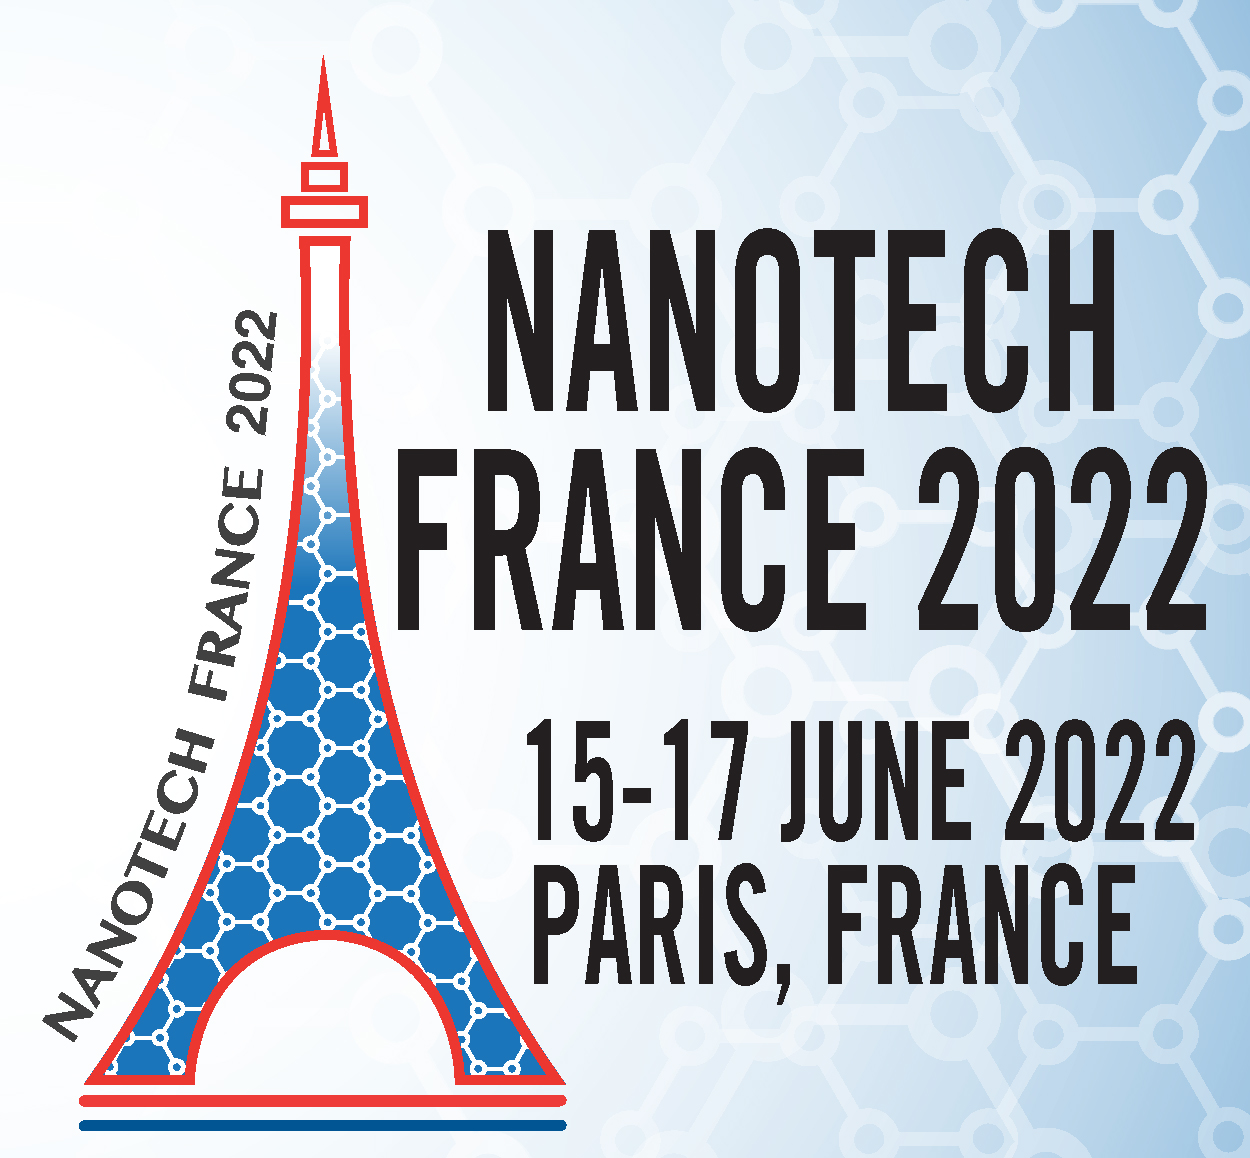 Nanotech France 2022 Conference and Exhibition - Paris, France, 15 - 17 June, 2022